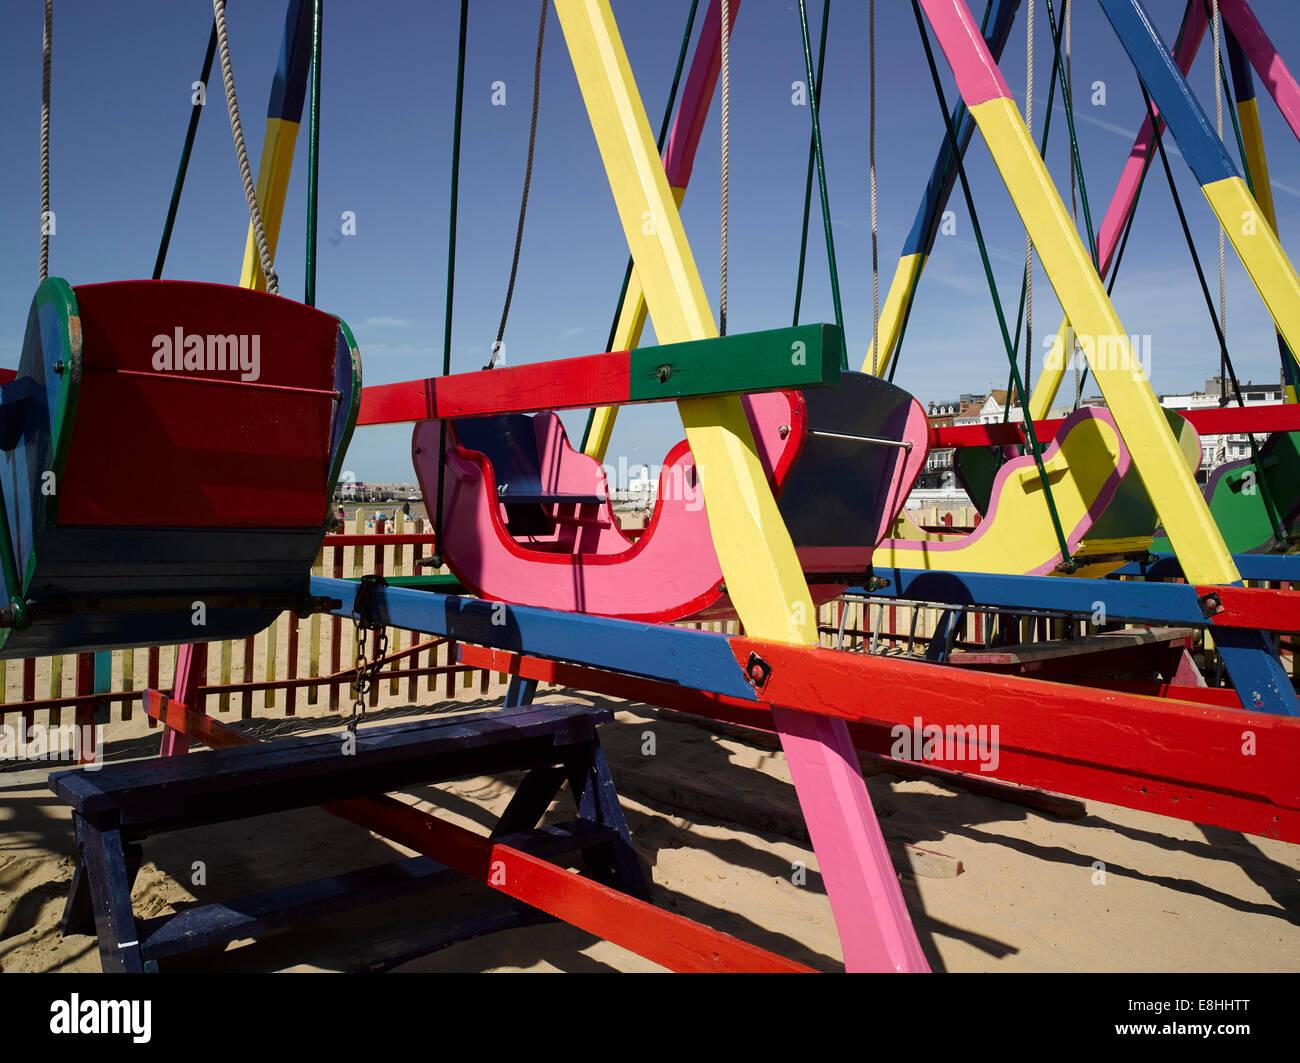 Wooden swings on Margate Beach, Kent, UK - Stock Image